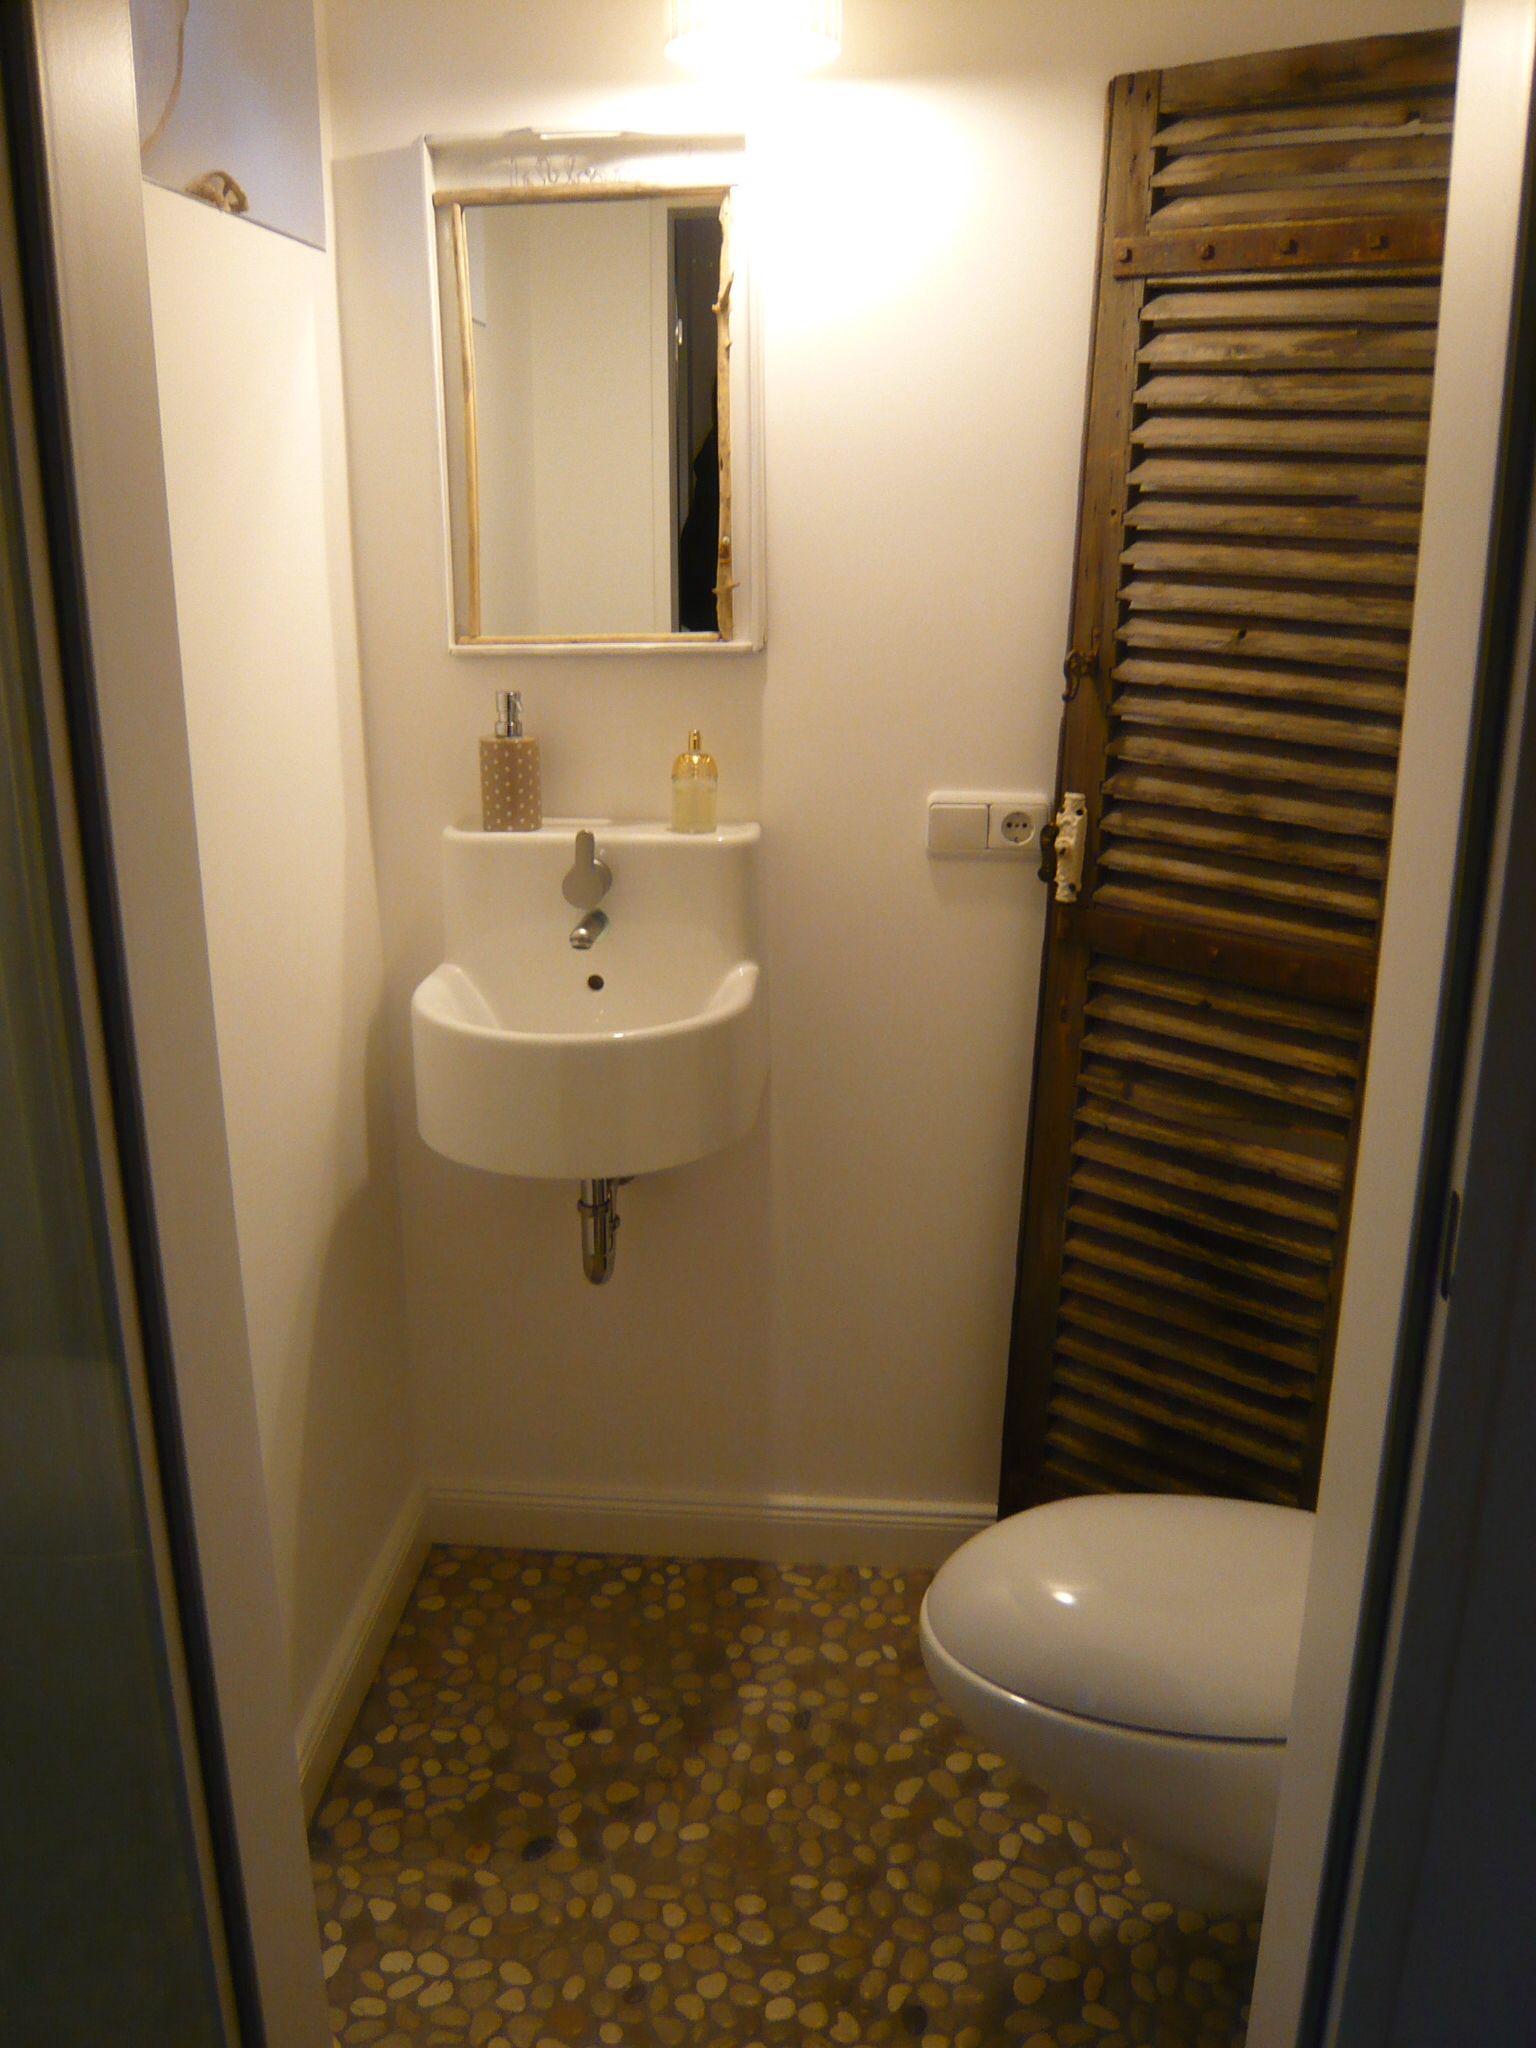 Kiesel Armaturen kiesel ikea waschbecken hidra toilette flusskiesel verputzte